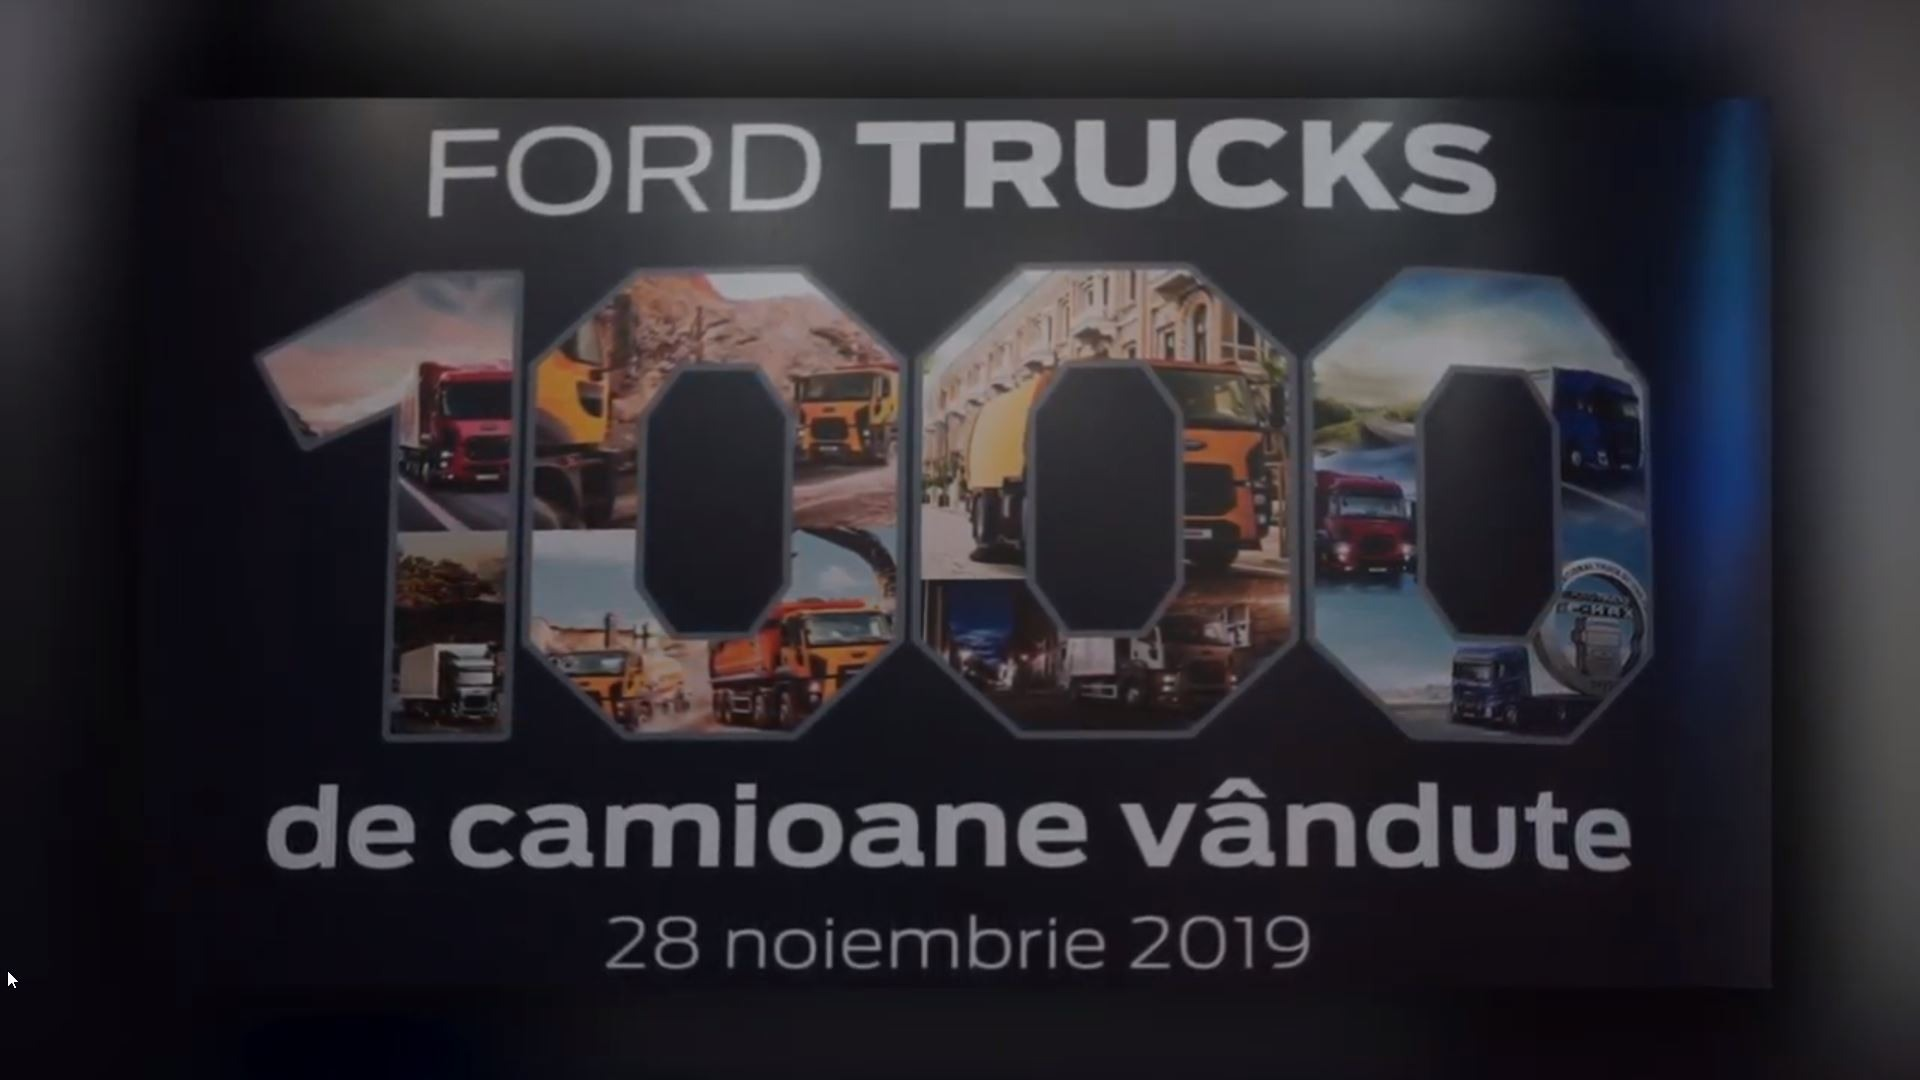 VIDEO - 1.000 camioane vandute - Noiembrie 2019